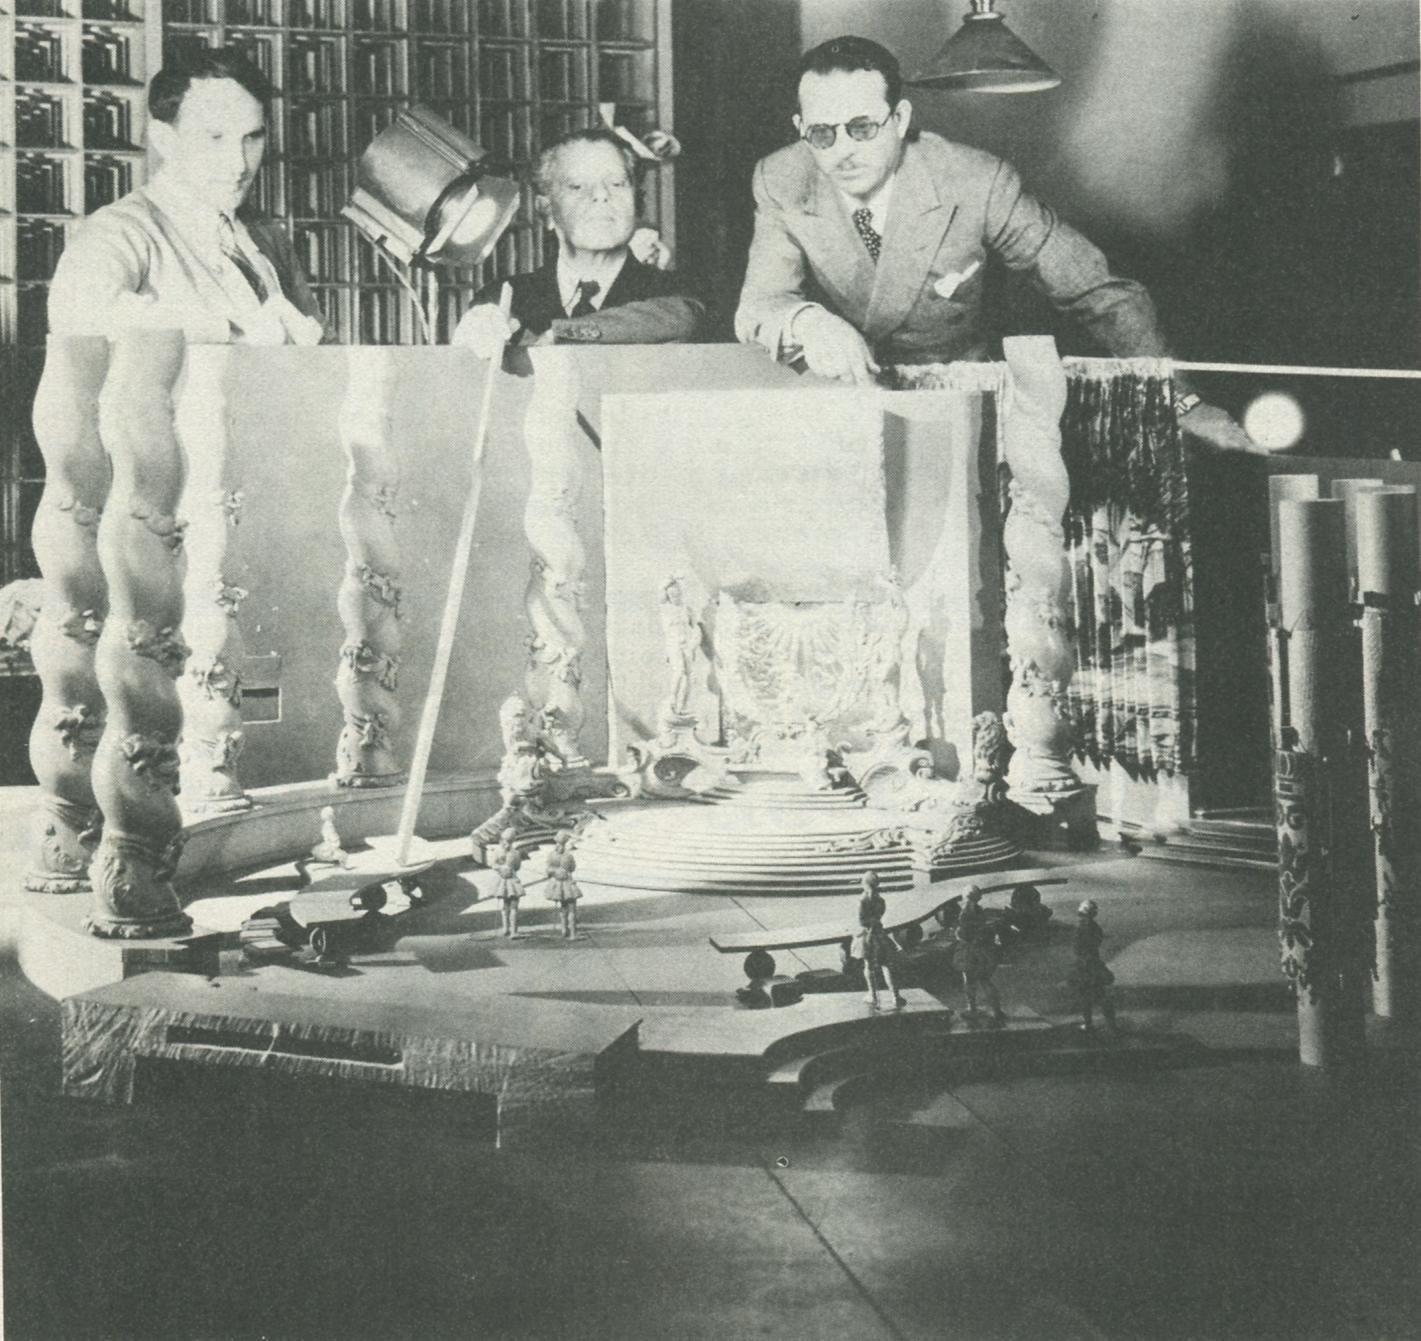 William Dieterle and Max Reinhardt in A Midsummer Night's Dream (1935)